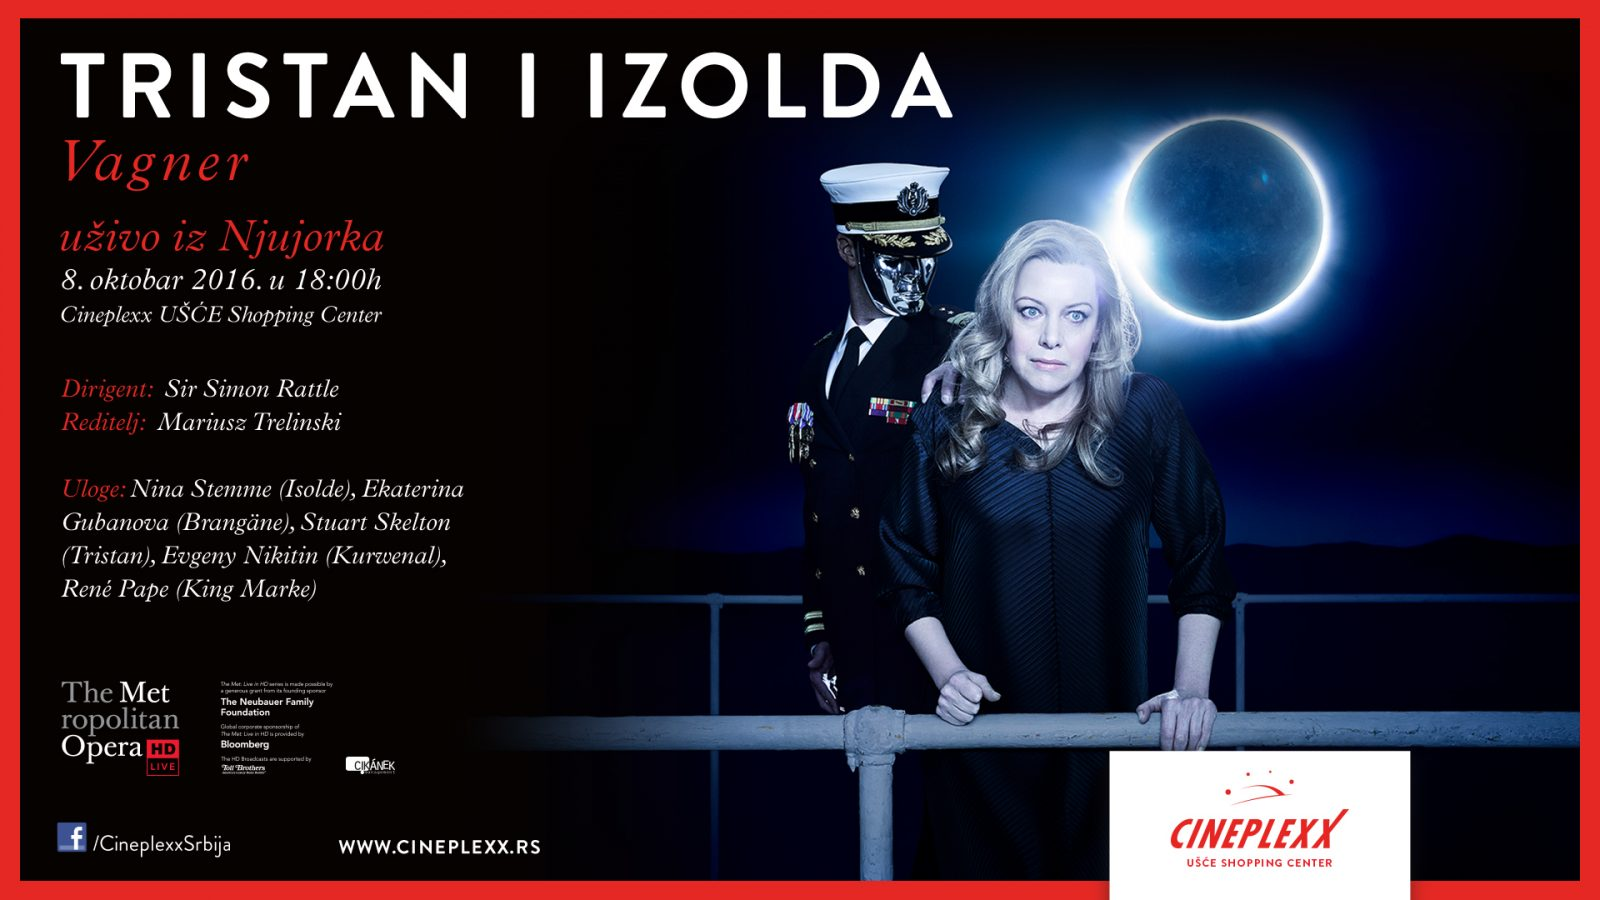 Večeras Vagnerova opera uživo u bioskopu Cineplexx UŠĆE Shopping Center